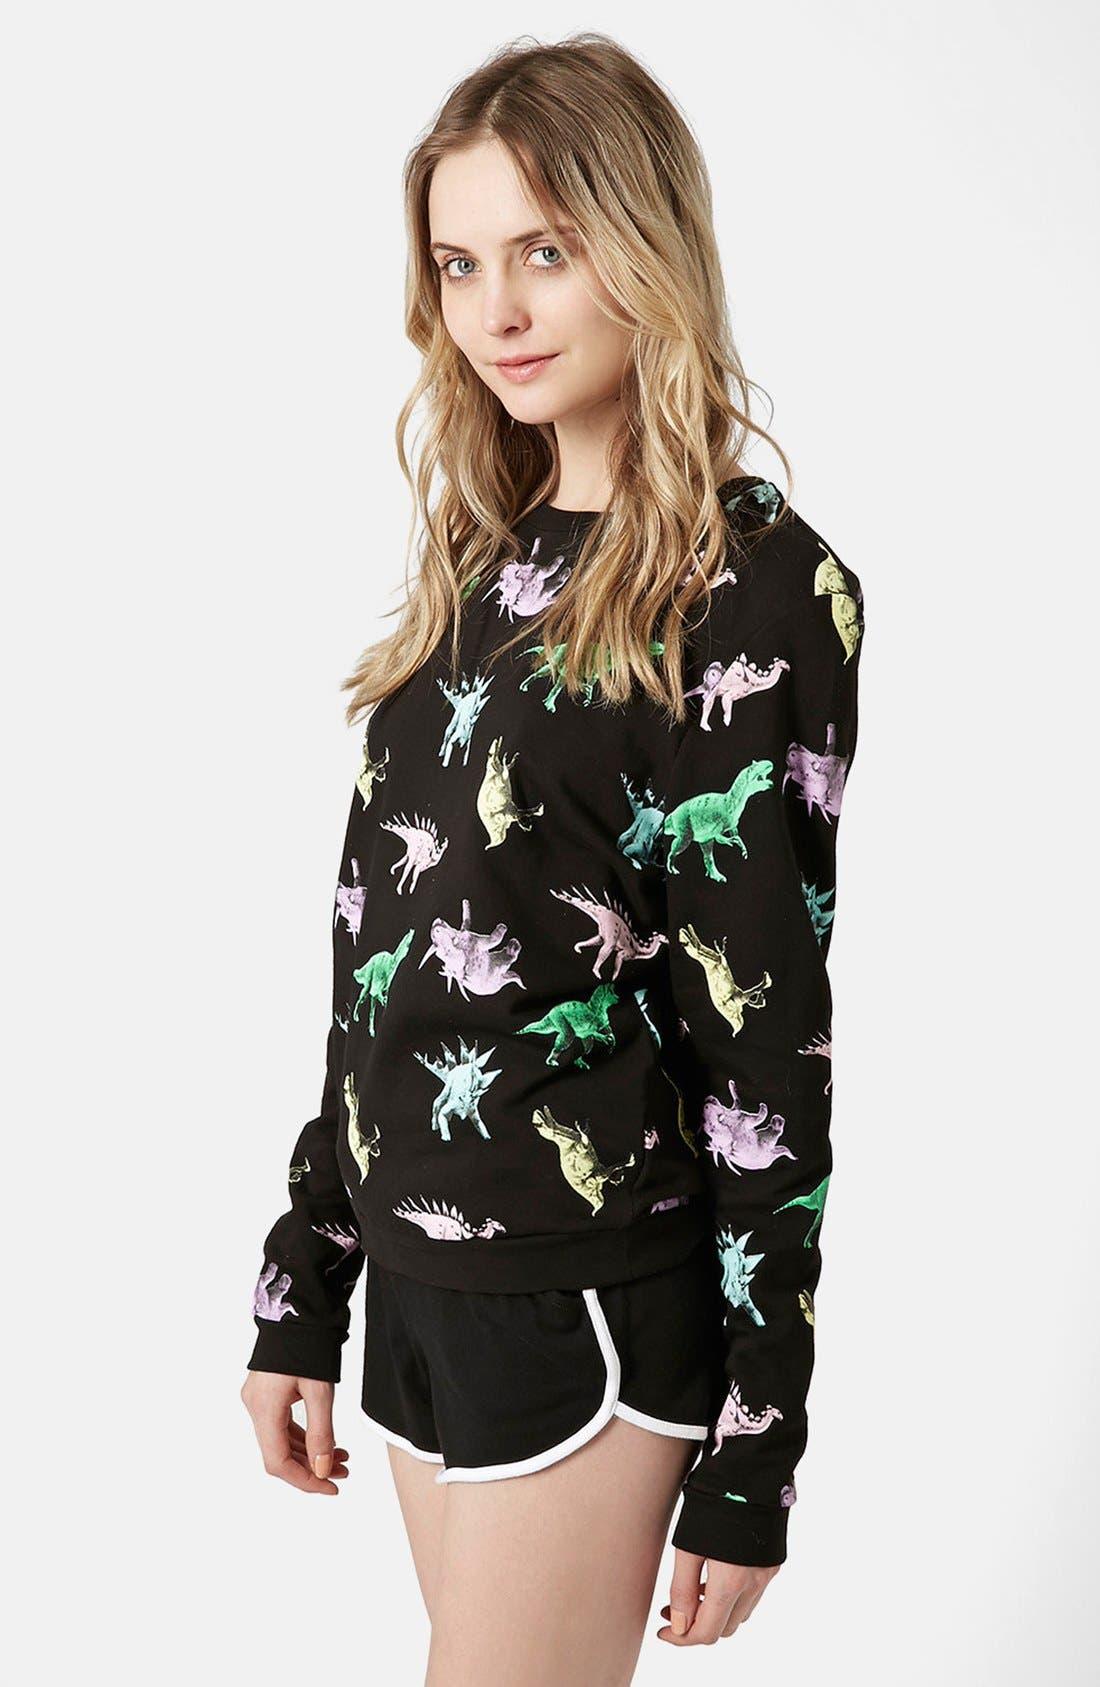 Alternate Image 1 Selected - Topshop Fleece Lined Dinosaur Sweatshirt